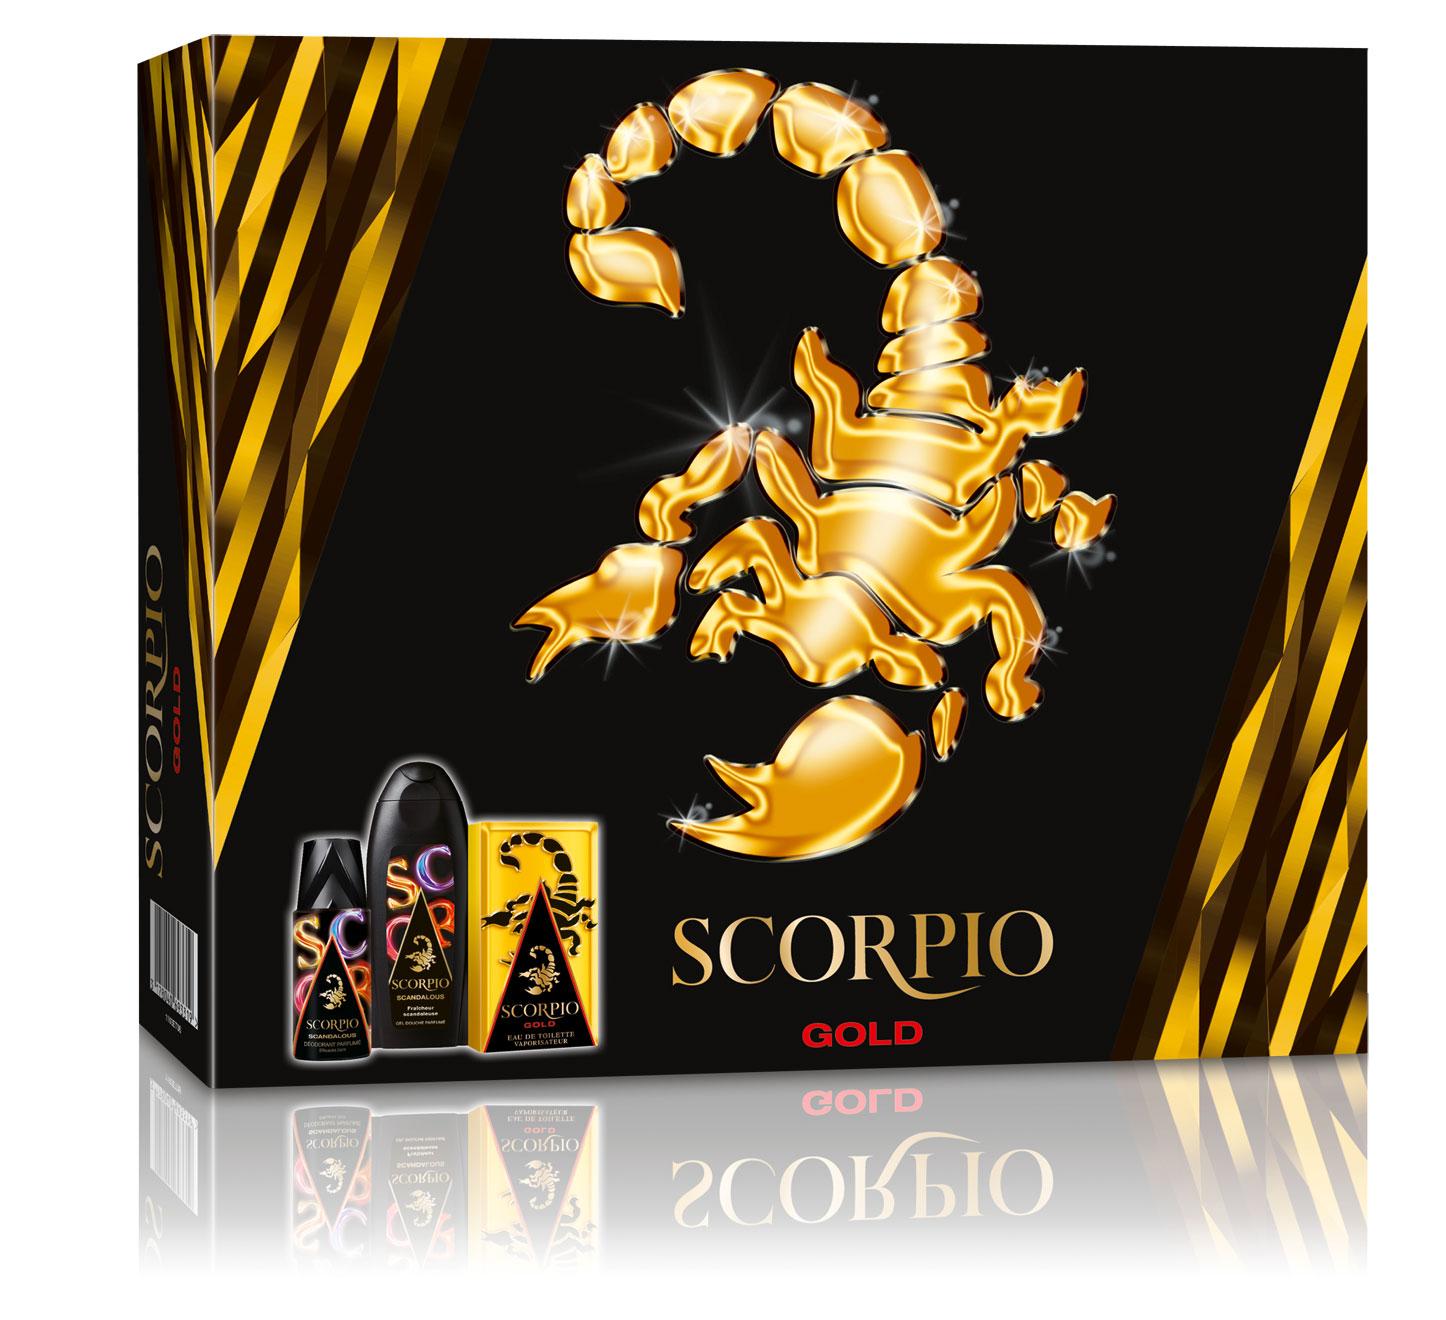 Coffret Scorpio, une Saint-Valentin très virile